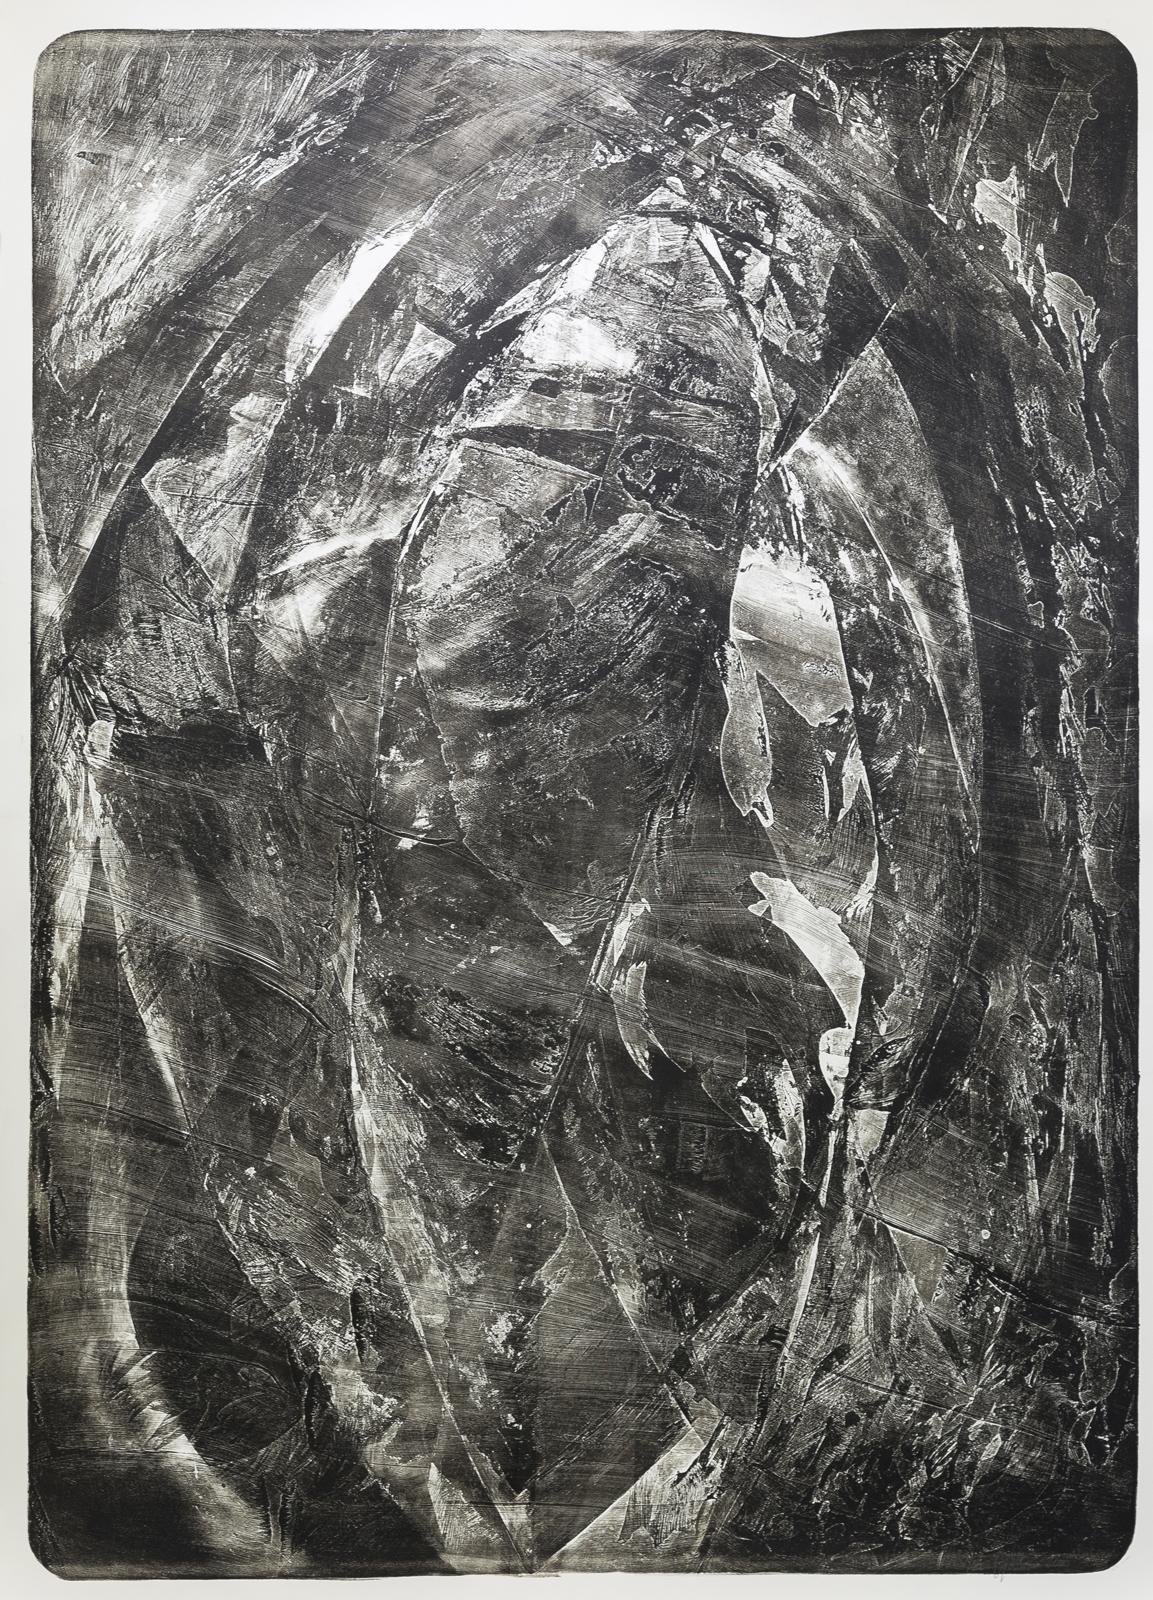 Palimpsest 1 Pachacamac, 2020, Steindruck, 181x131cm